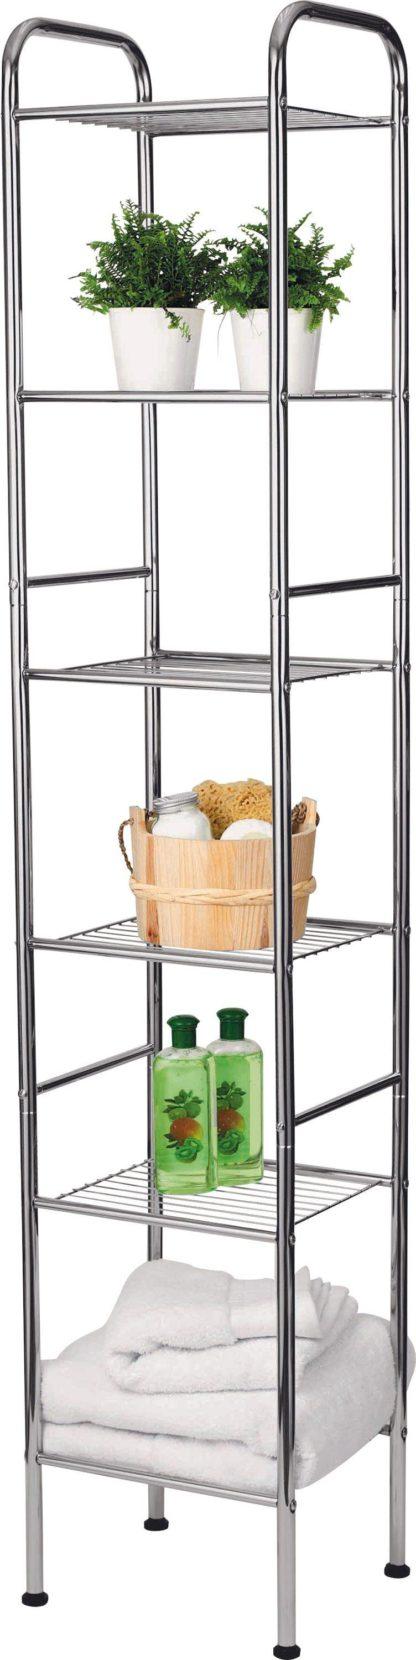 An Image of Argos Home 6 Tier Wire Shelf Unit